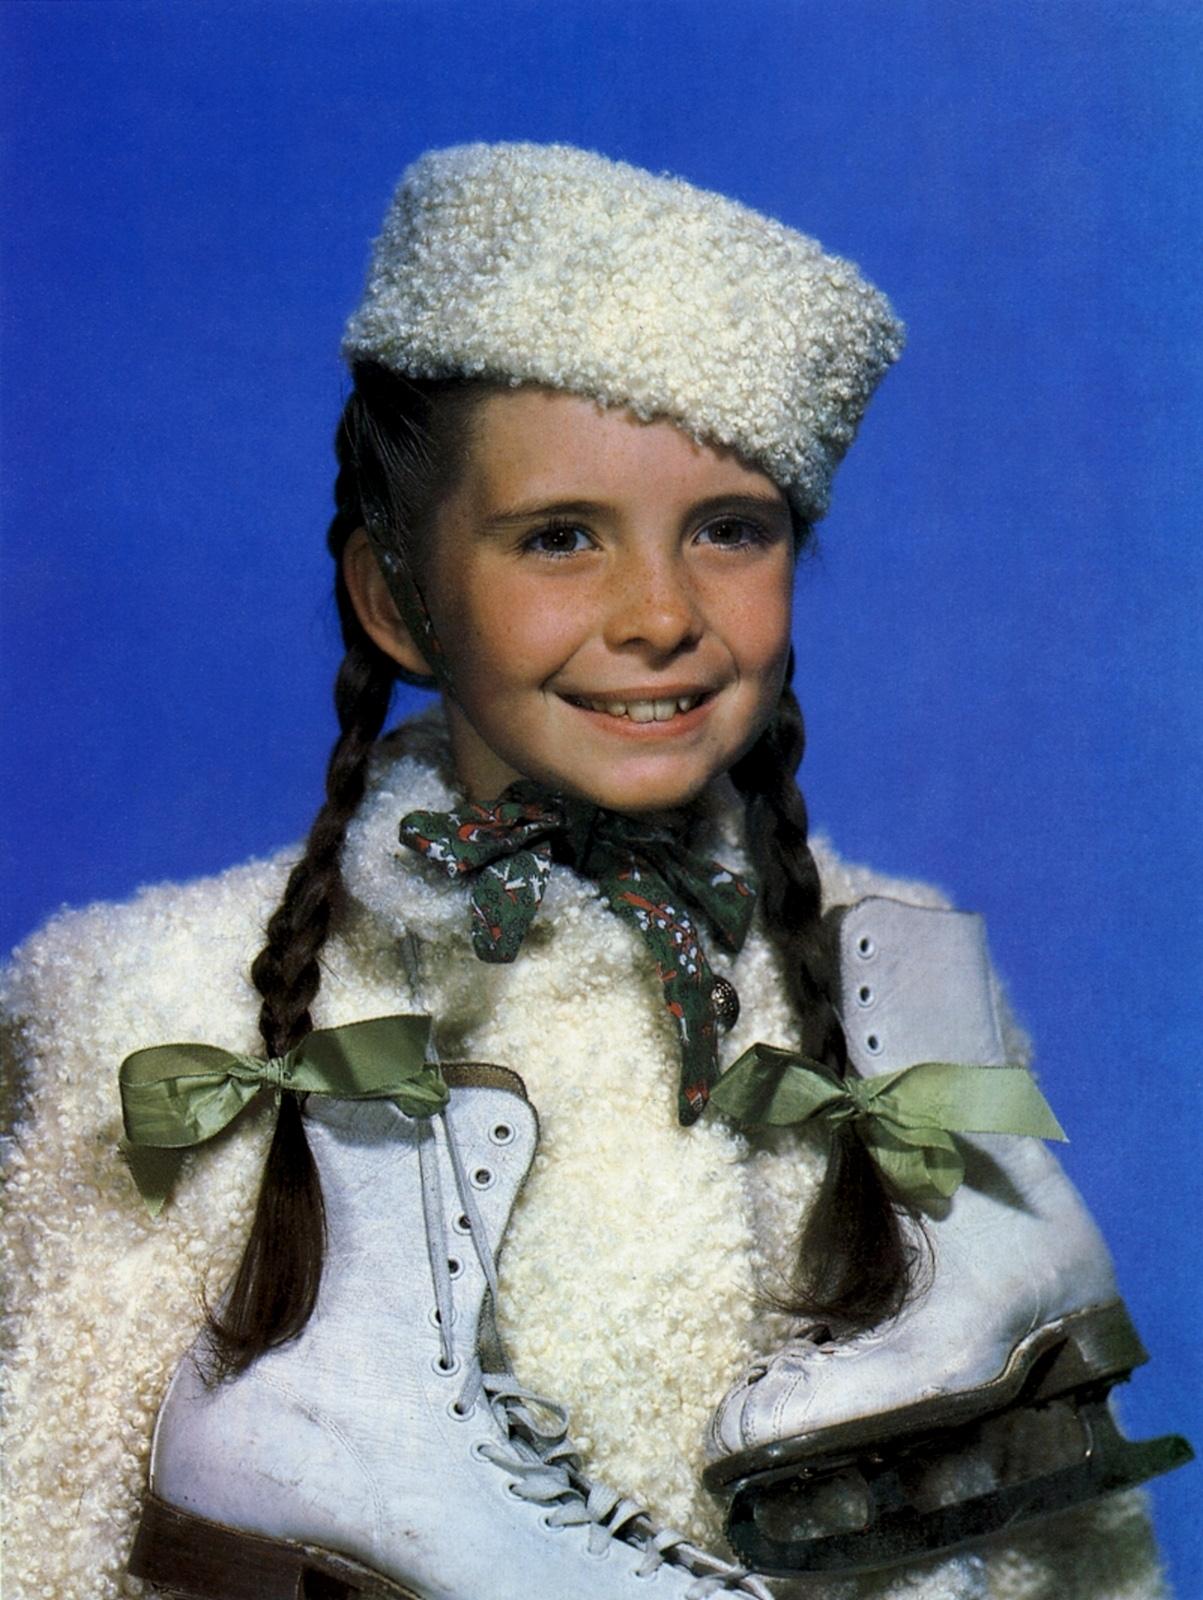 Emma Heming GBR 1 2001,Will Mellor (born 1976) Adult pic Lenore Lonergan,Britta Phillips